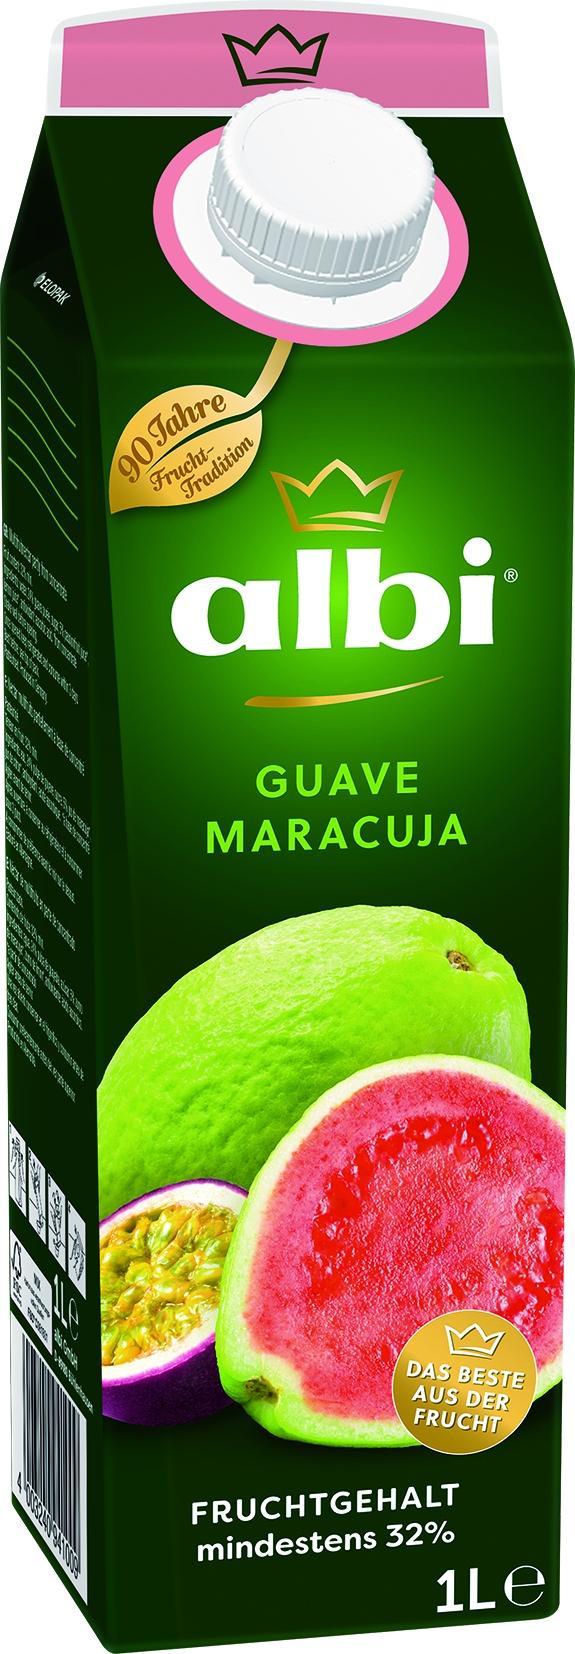 Guave-Maracuja